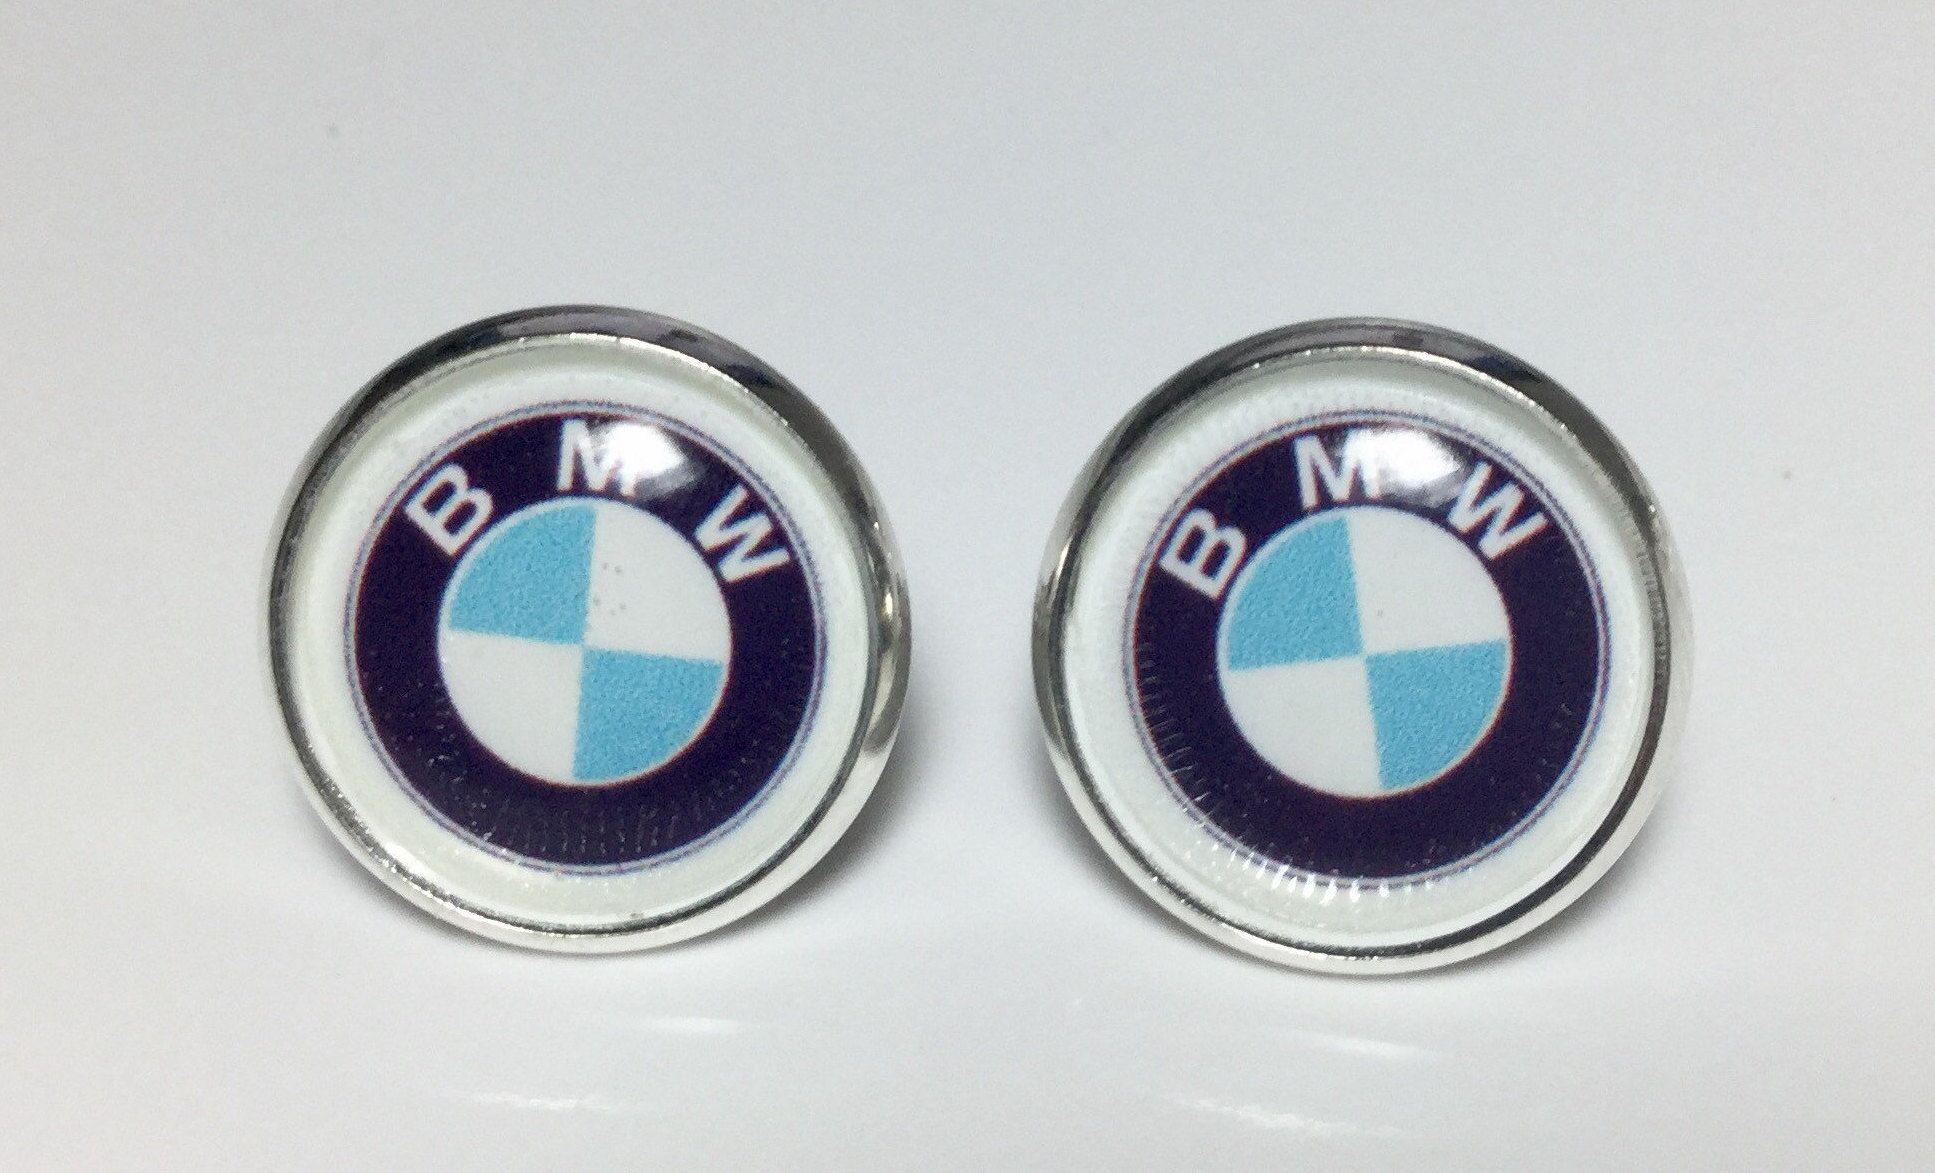 BMW Earrings BMW Logo Jewelry Luxury Classic Car Lovers